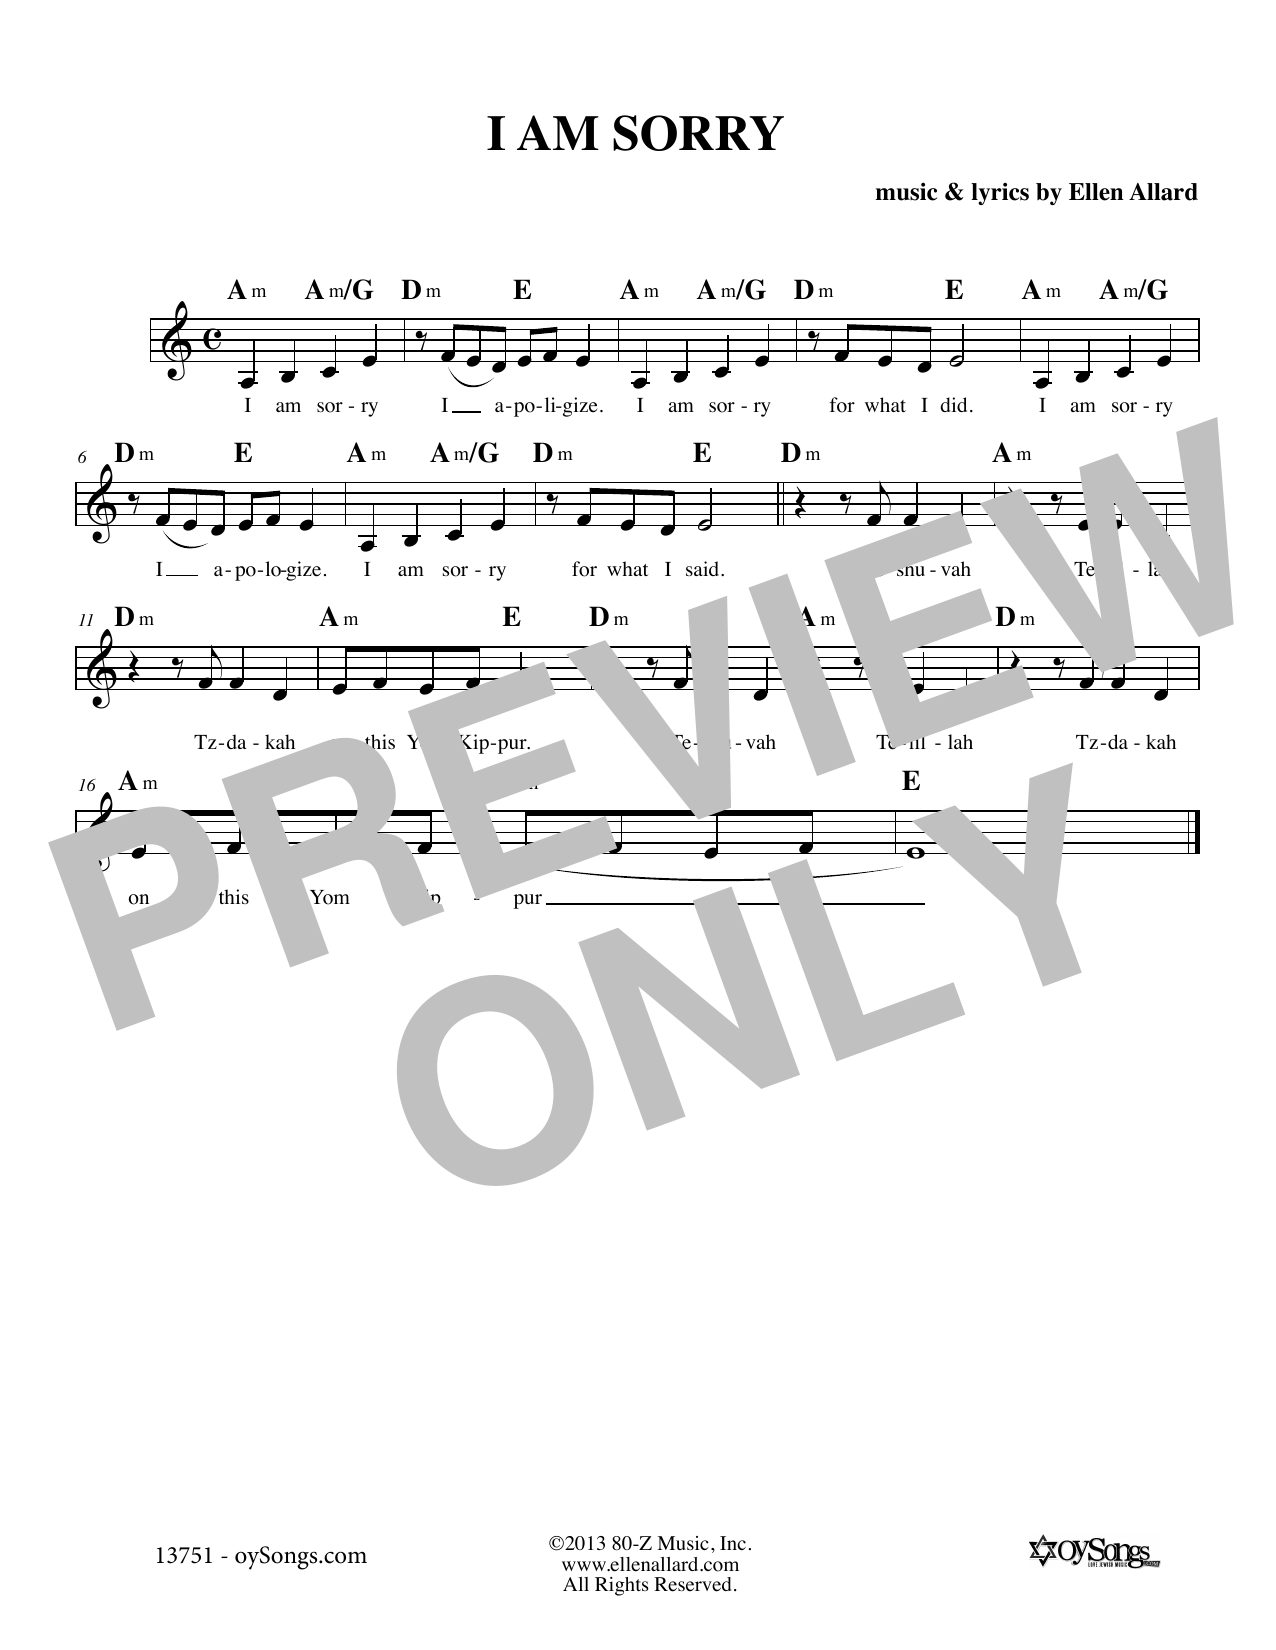 Ellen Allard I Am Sorry sheet music notes and chords. Download Printable PDF.